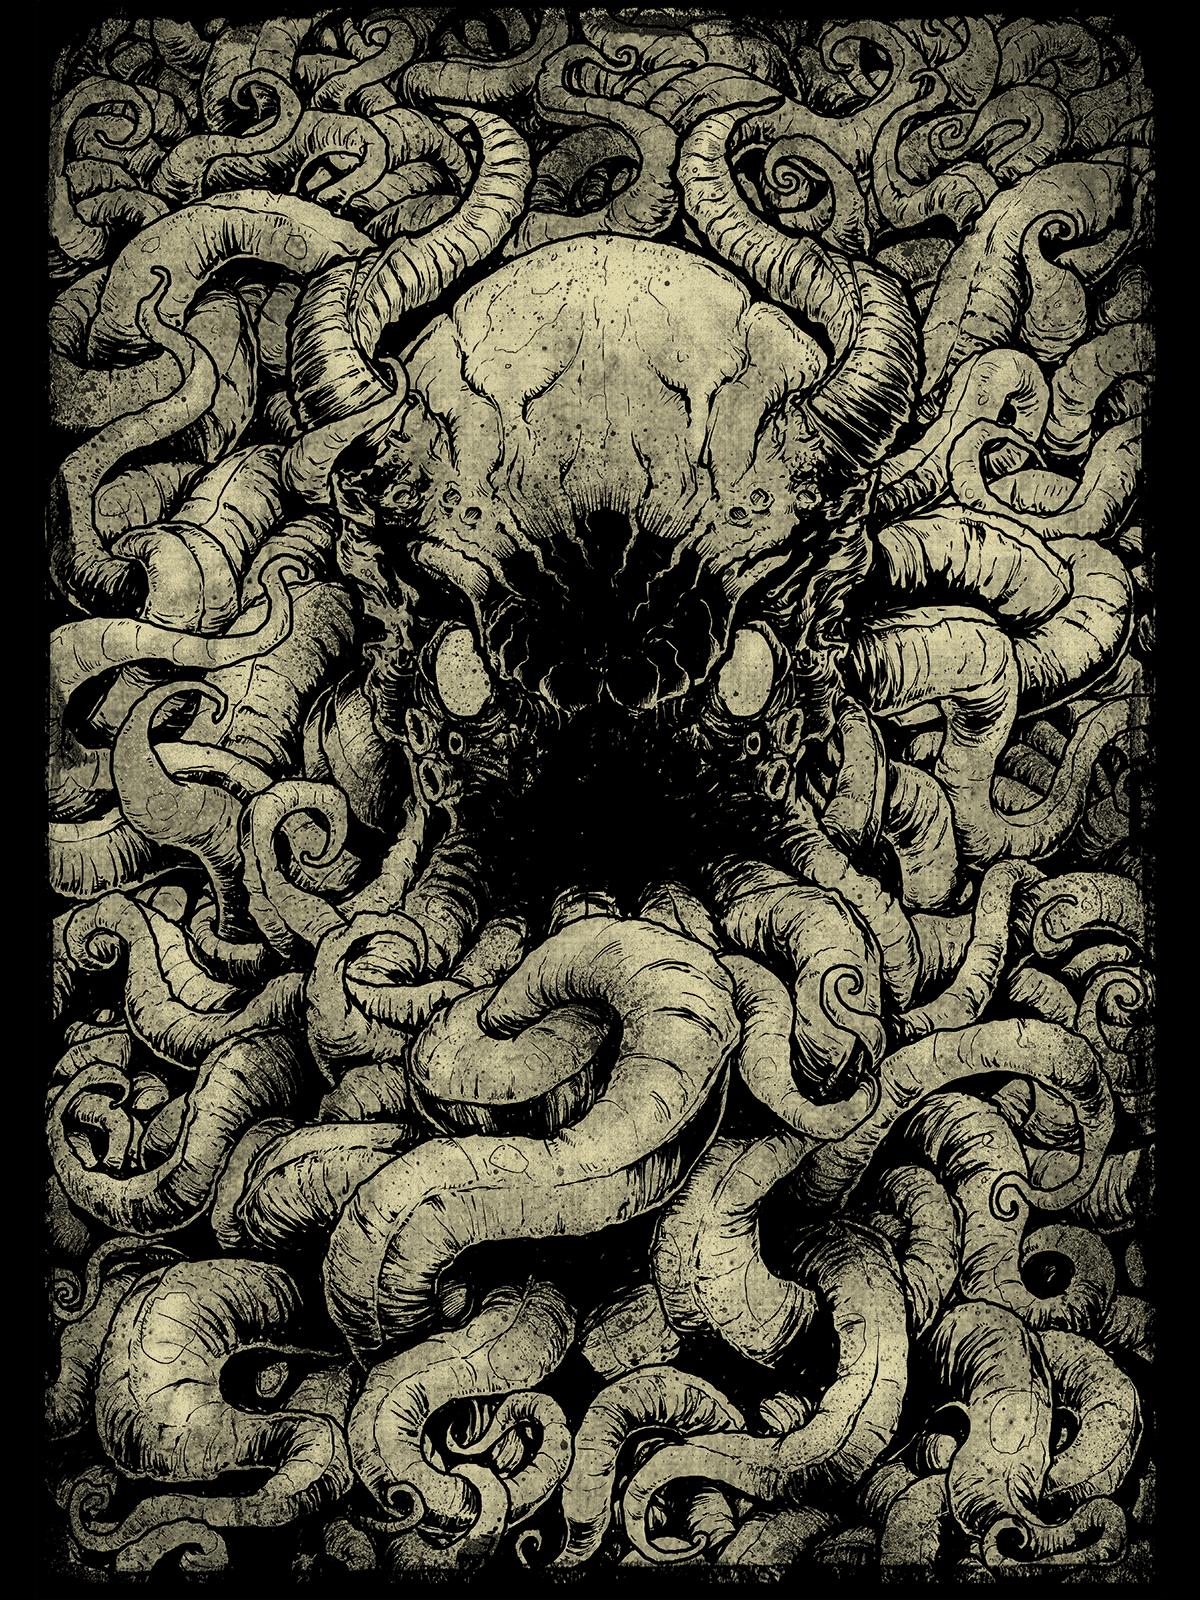 Kraken Screenprint By Godmachine Trampt Library